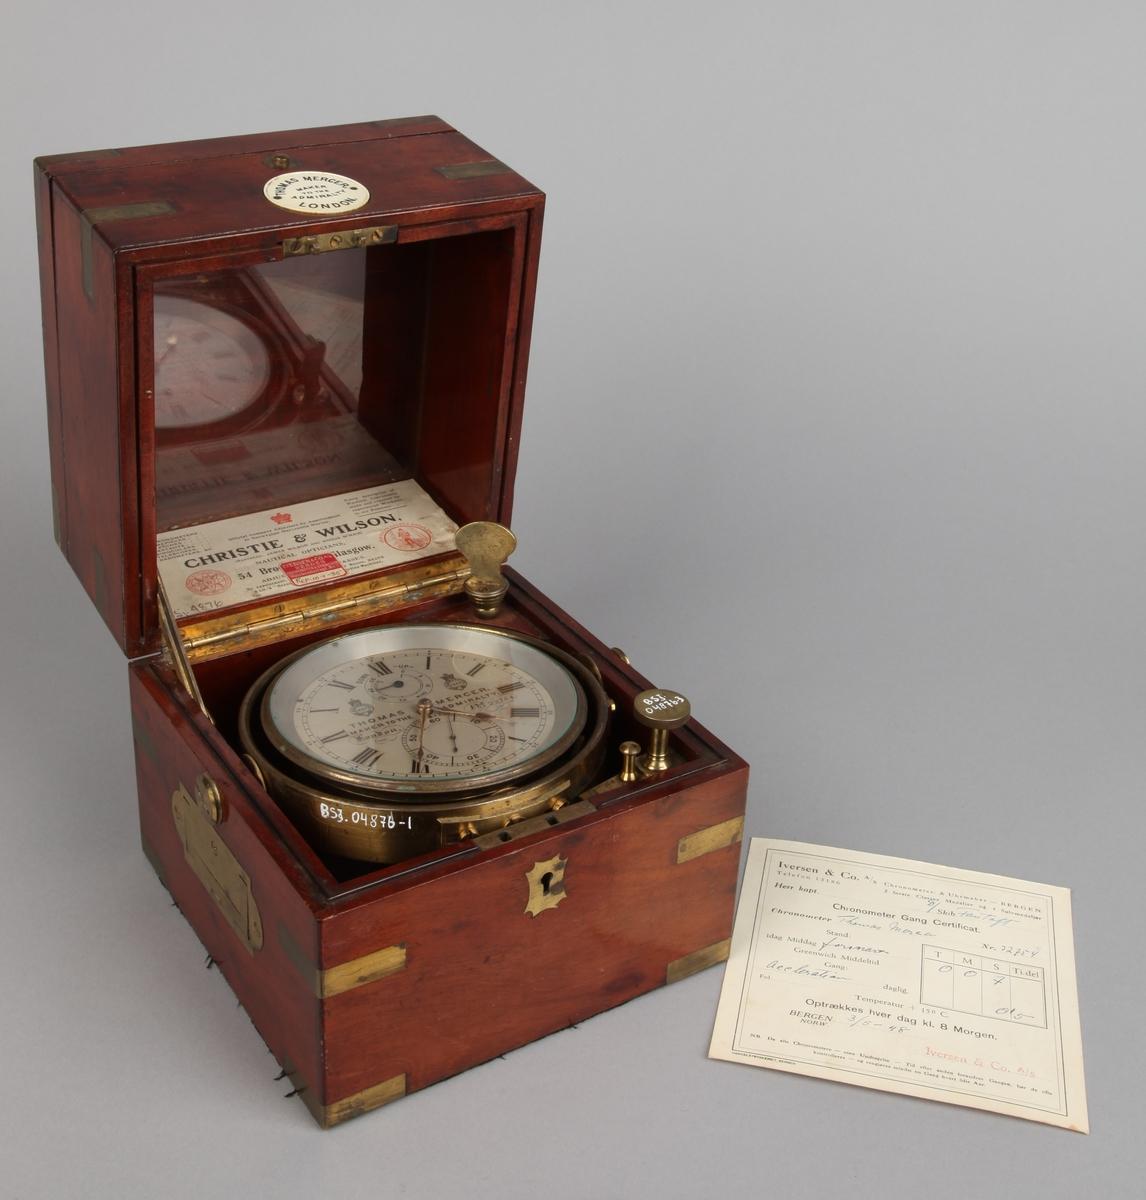 Rund kronometer fra DS FANTOFT,i messing i firkantet mahogny-kasse.